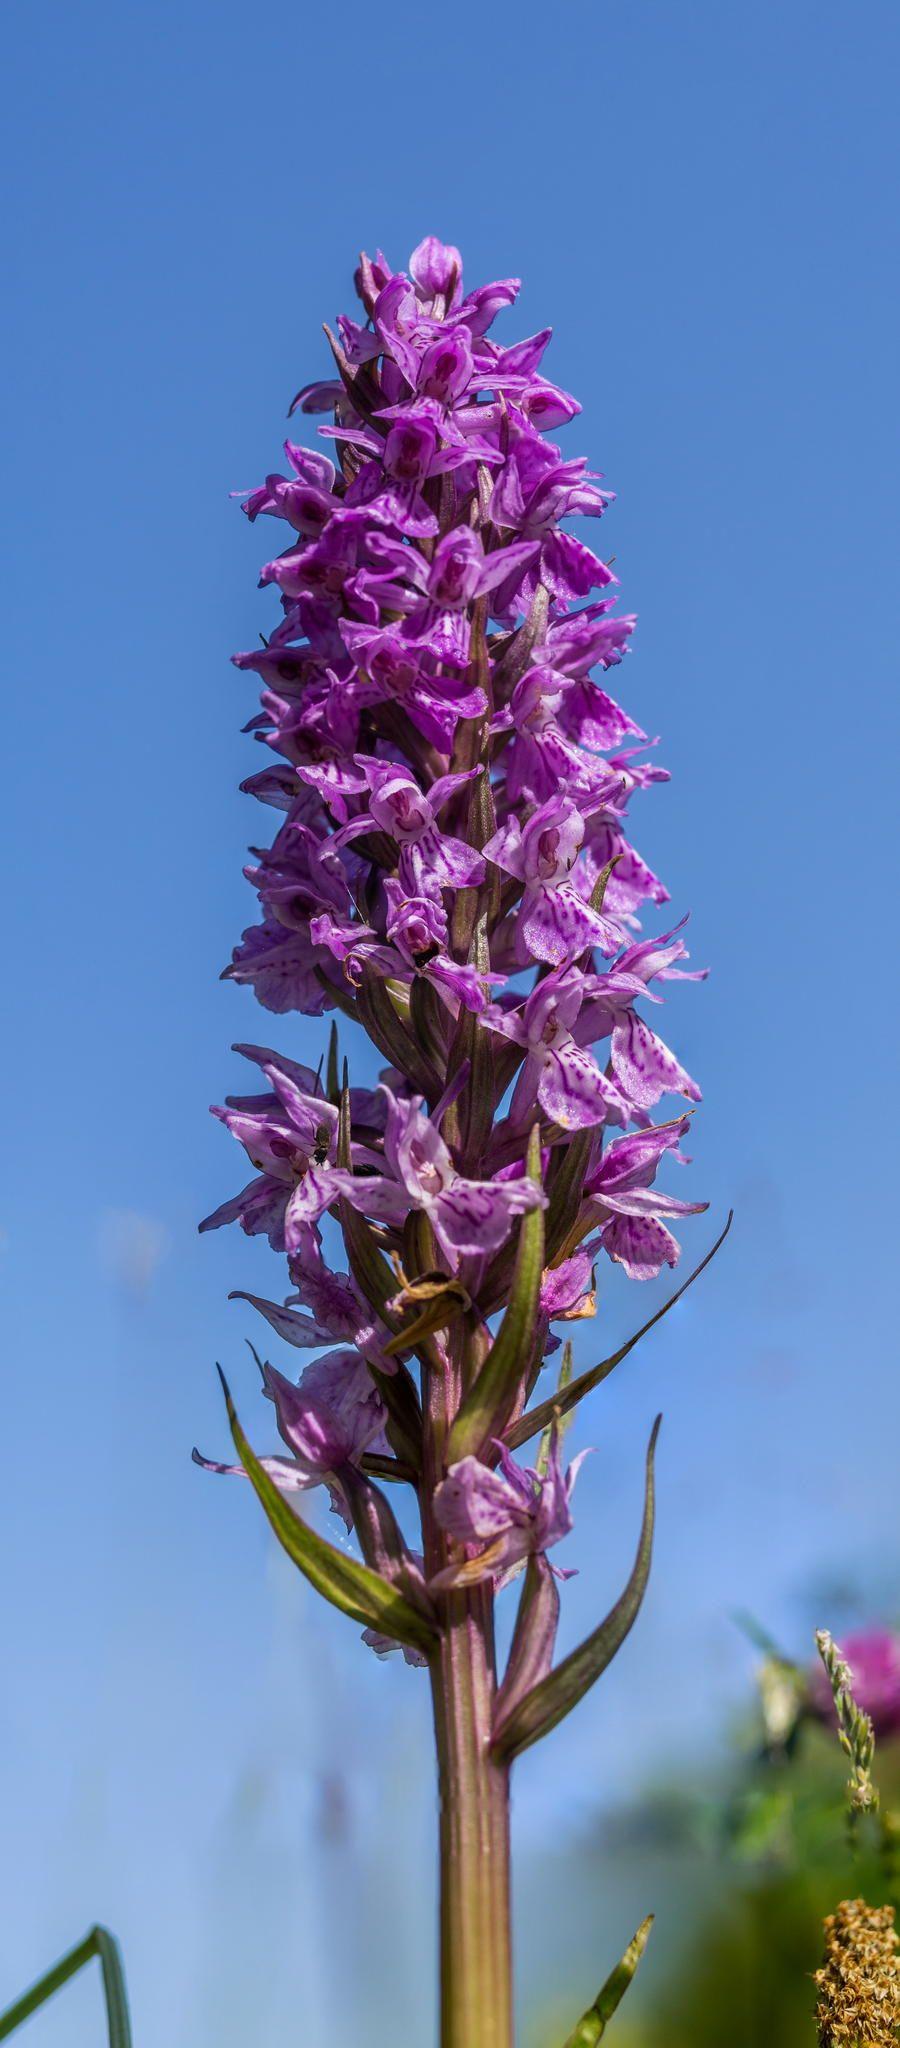 Leopard Marsh Orchid by Sake van Pelt on 500px